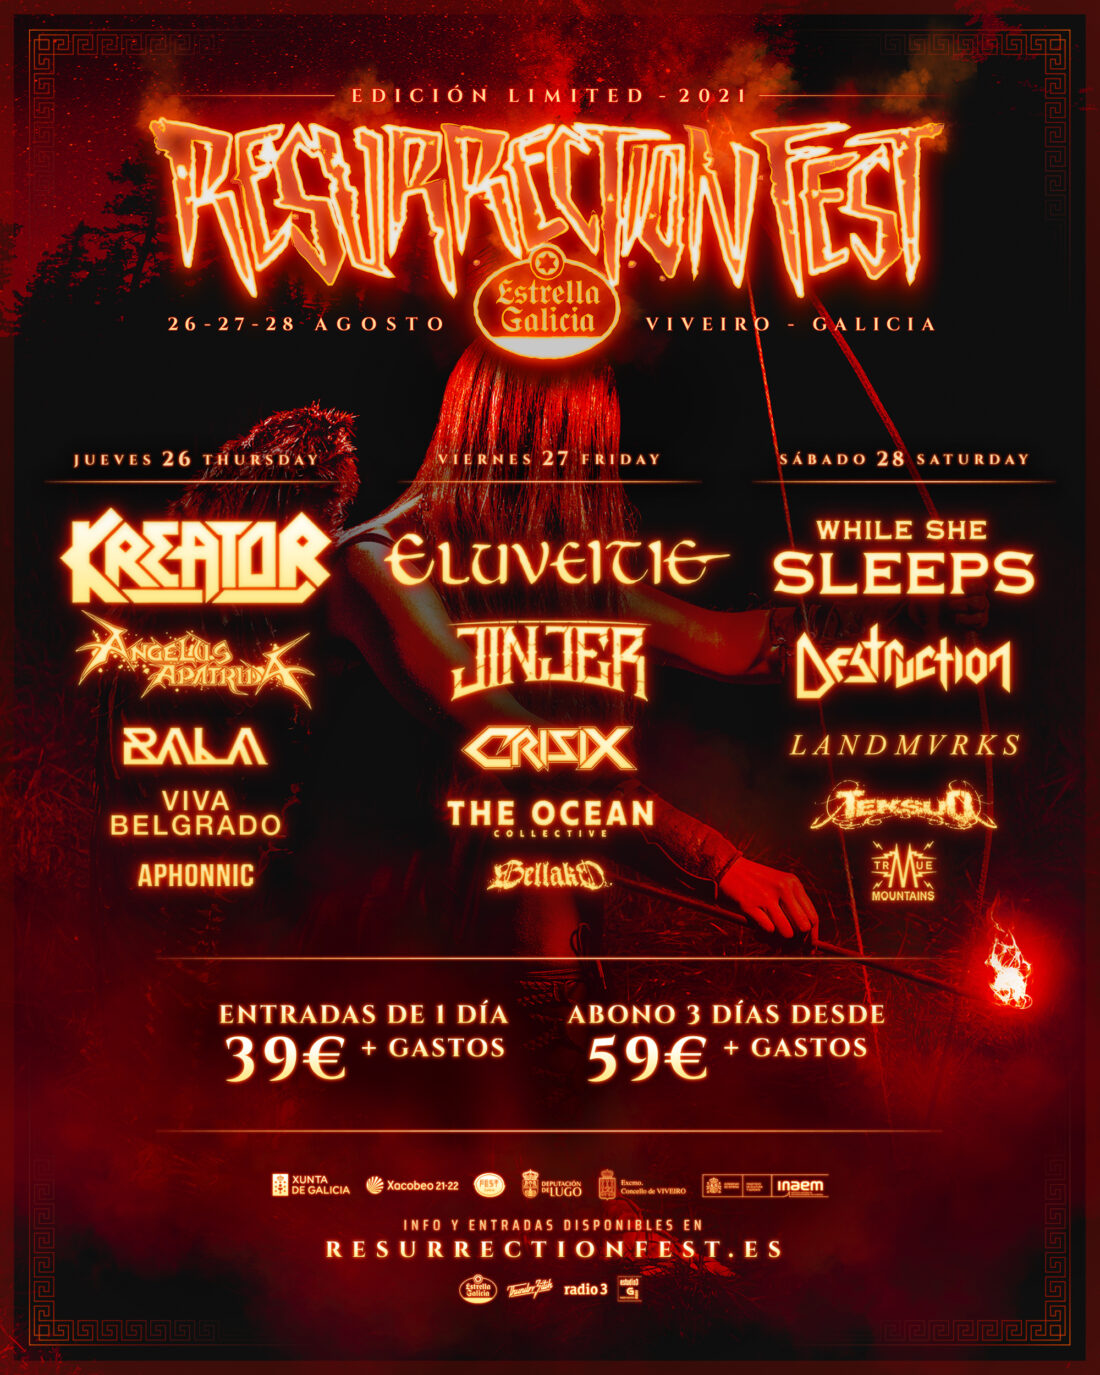 Resurrection Fest Estrella Galicia Limited 2021